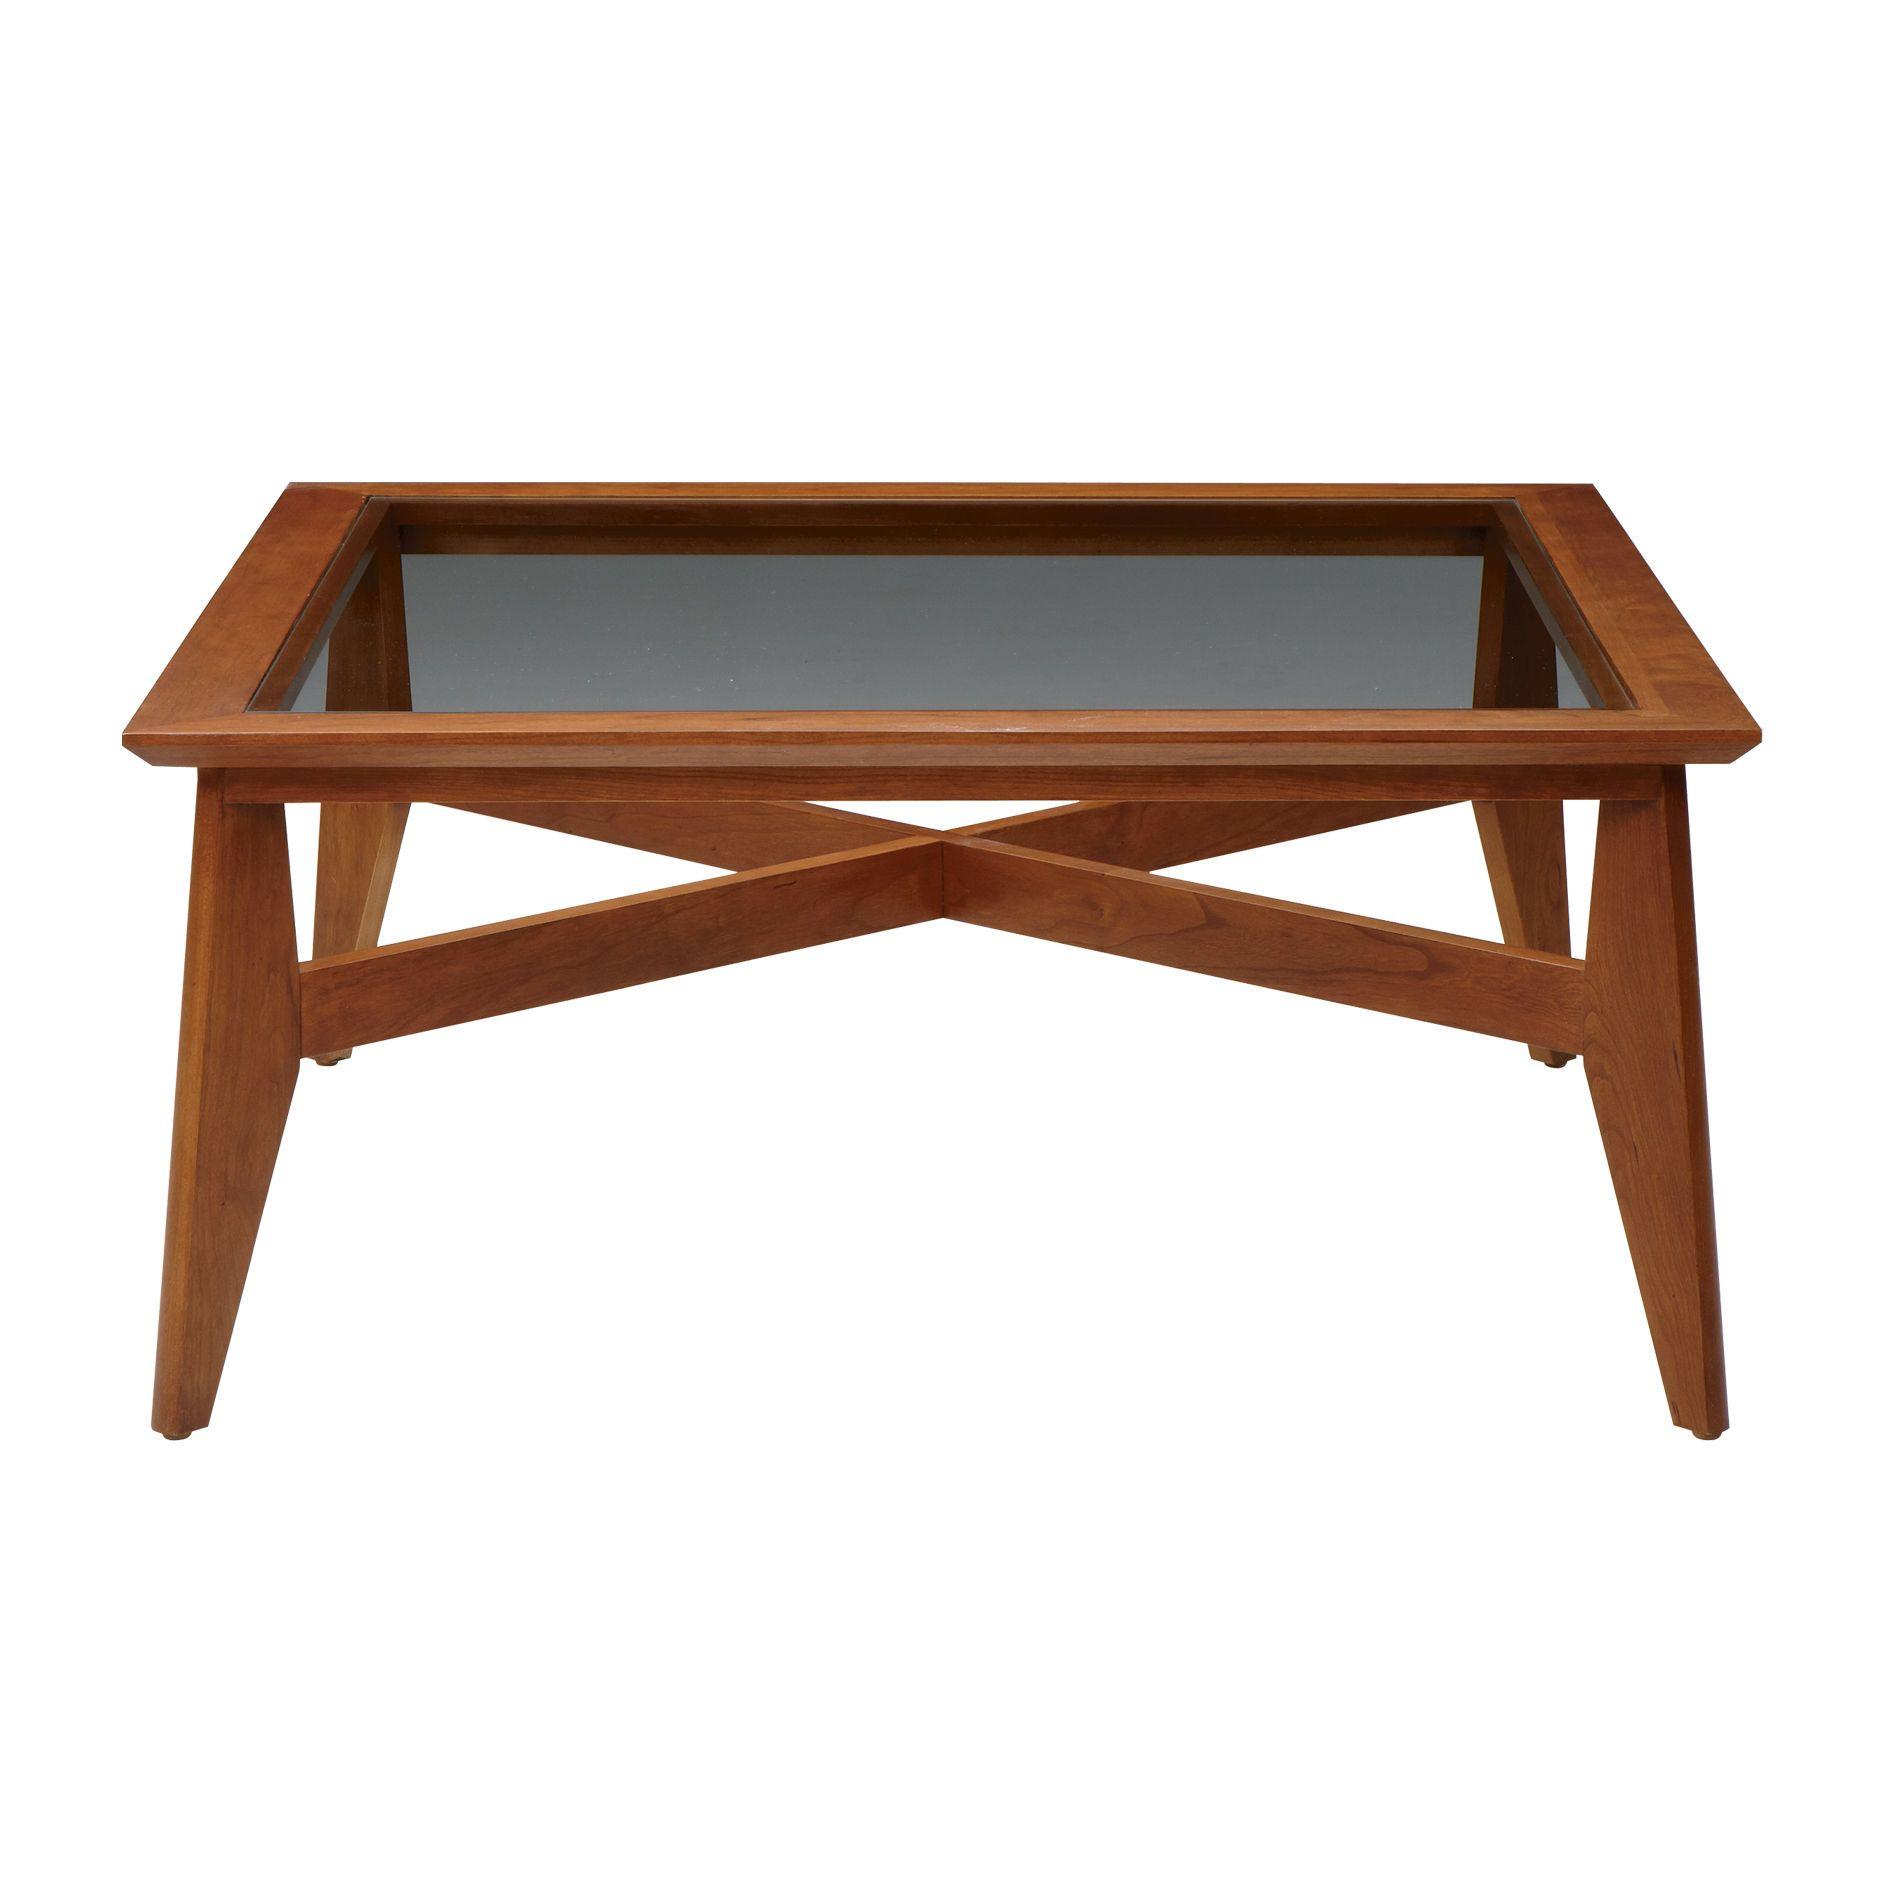 Copper Top Coffee Table Ethan Allen: Ethan Allen $636 38 X 38 X 17.5